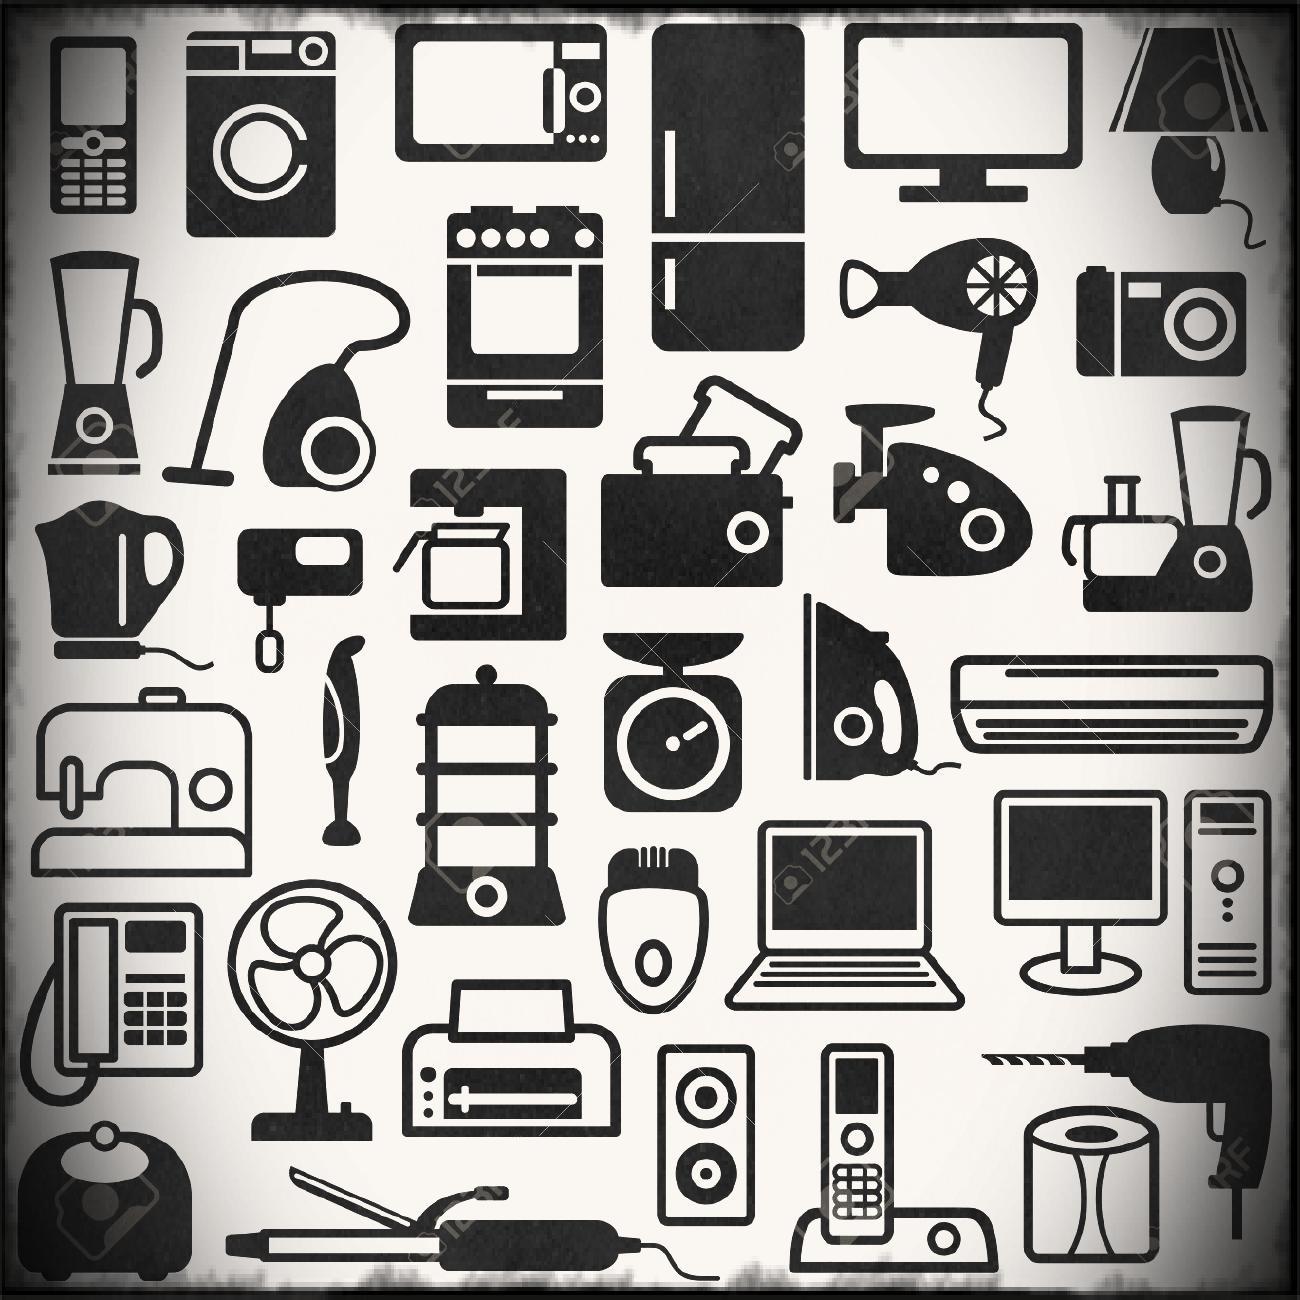 Household appliances clip art. Bedroom clipart appliance